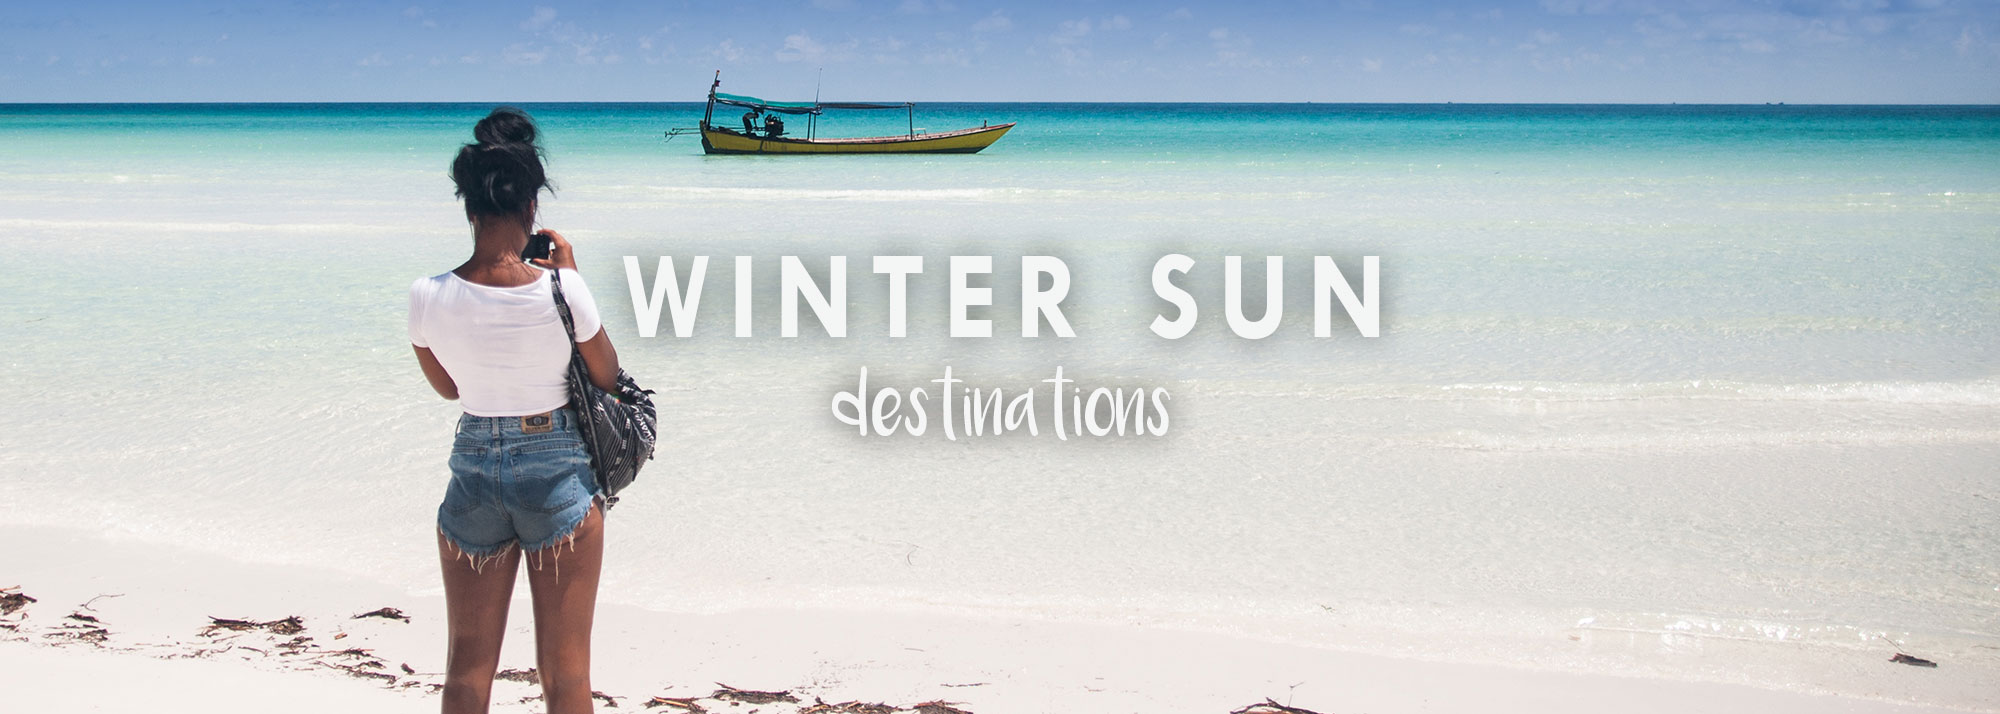 Our top winter sun destinations 2017!